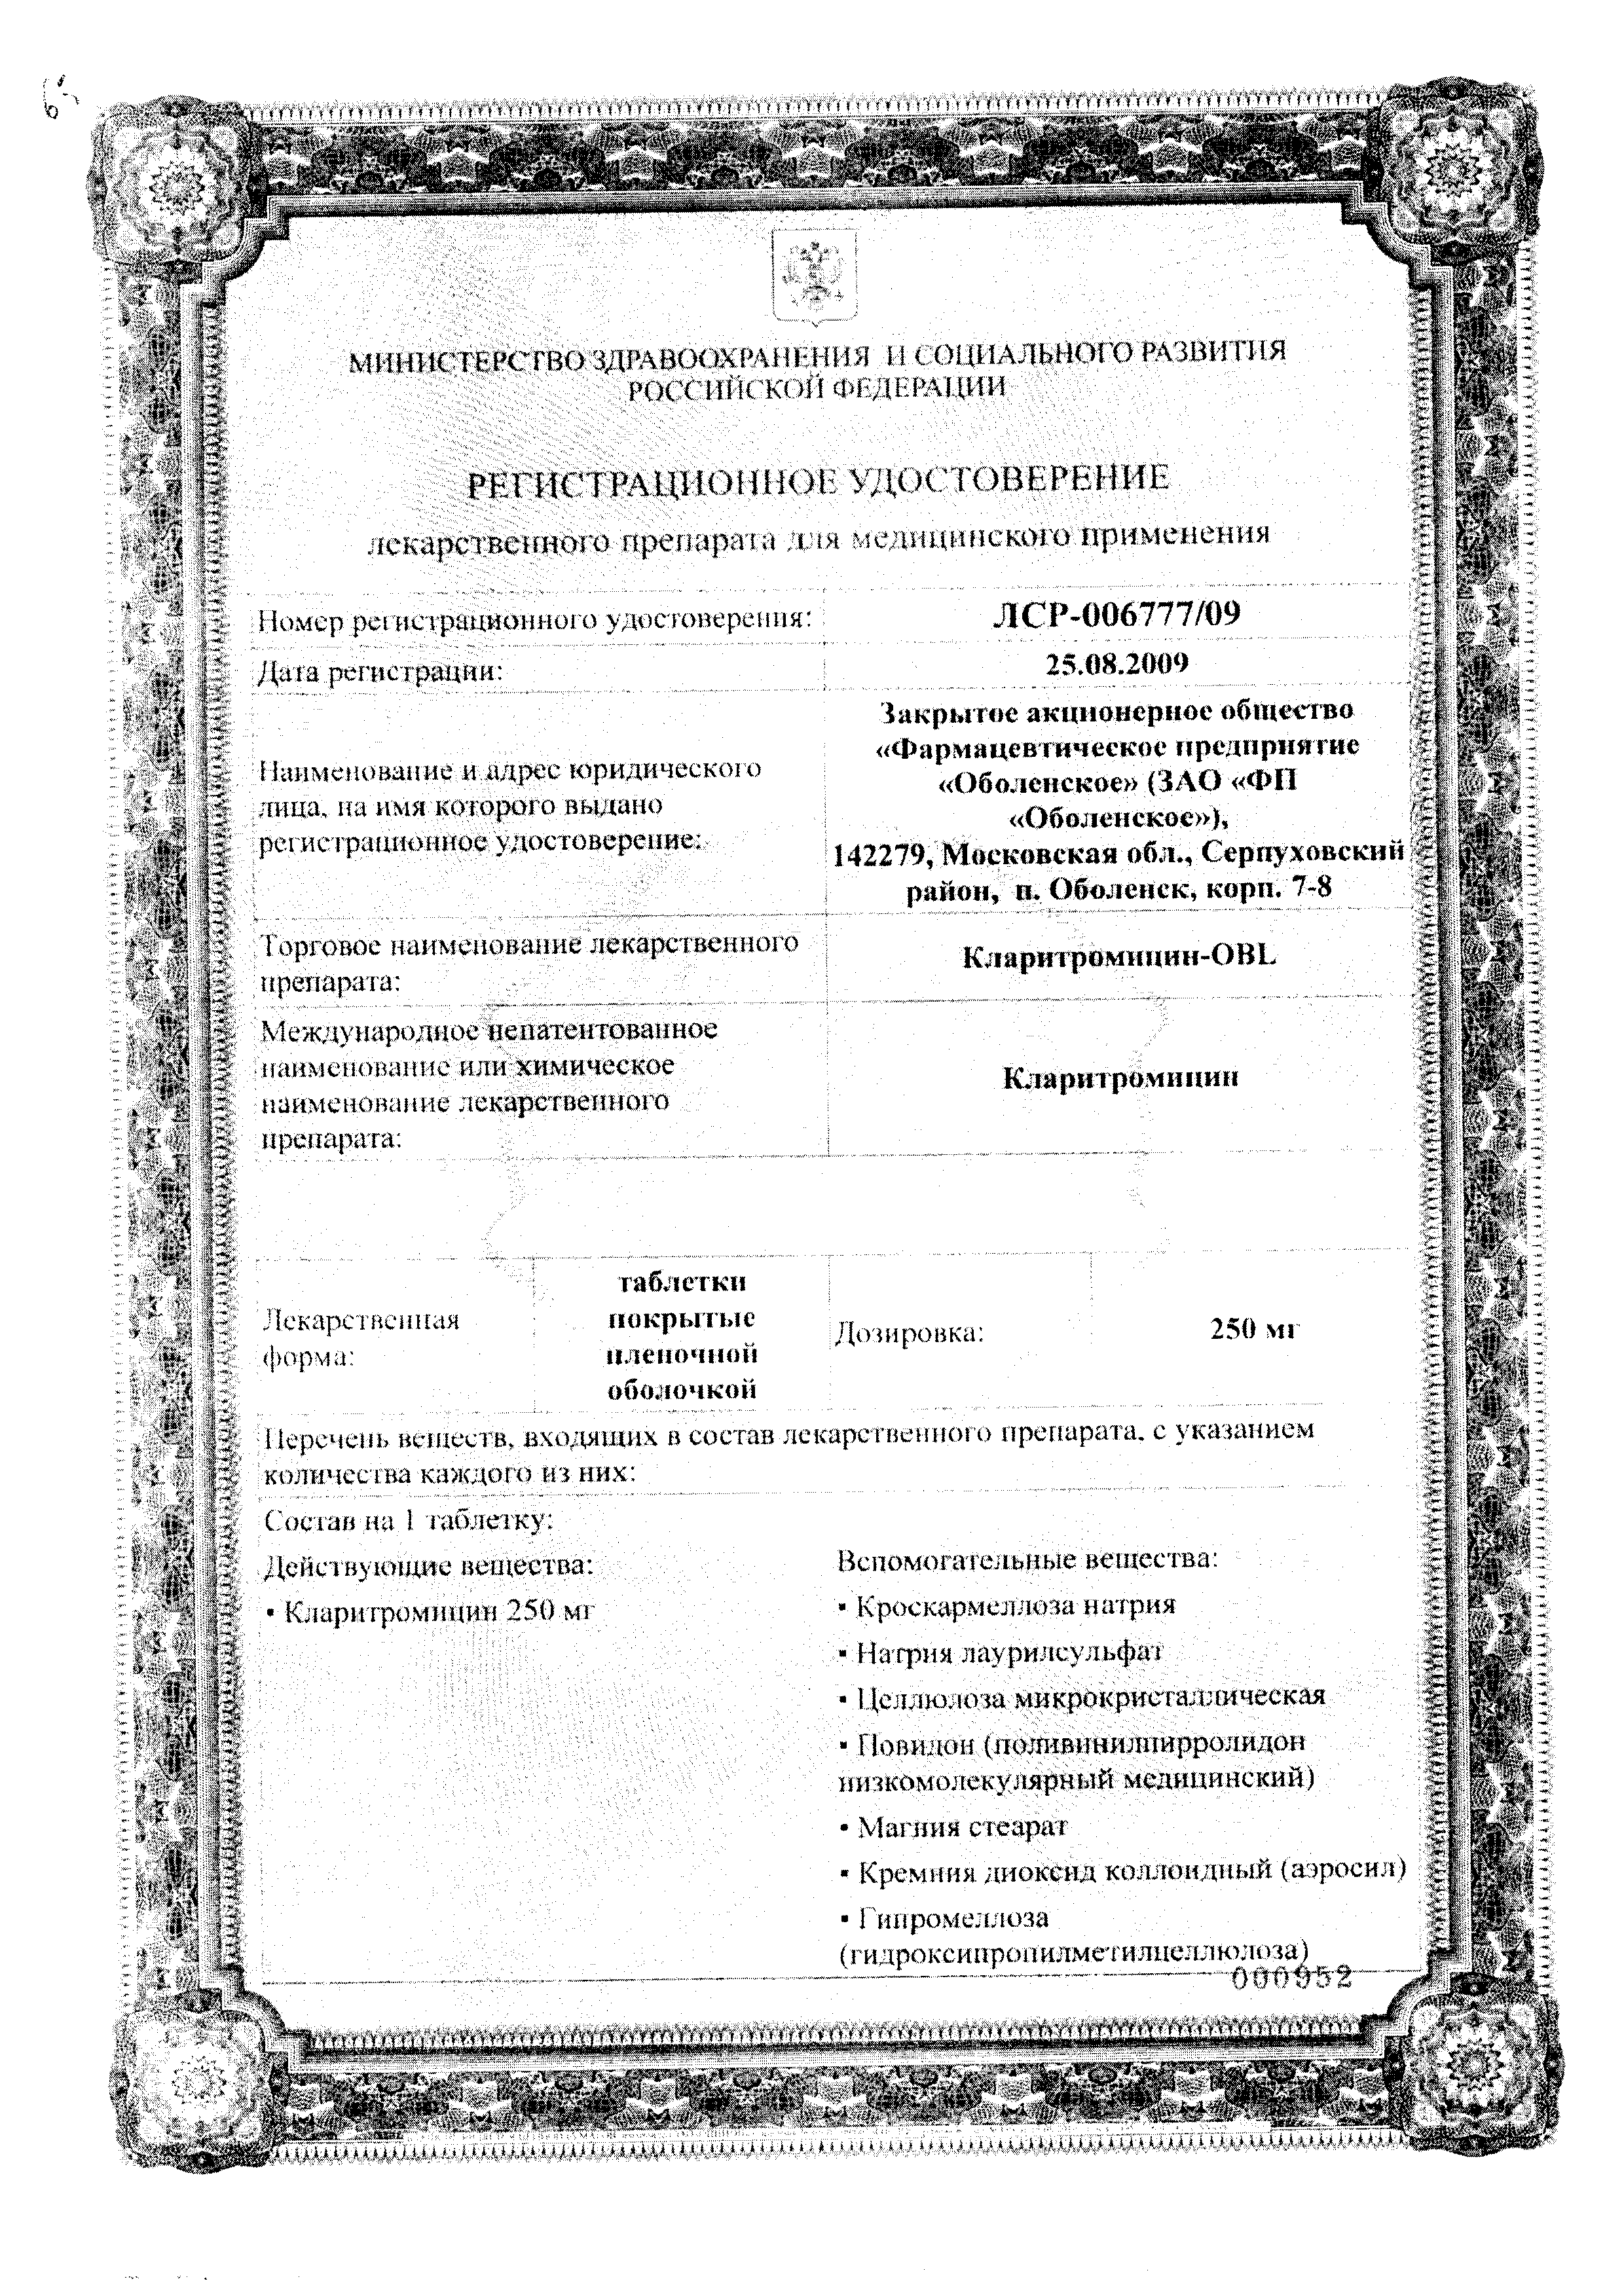 Кларитромицин-OBL сертификат